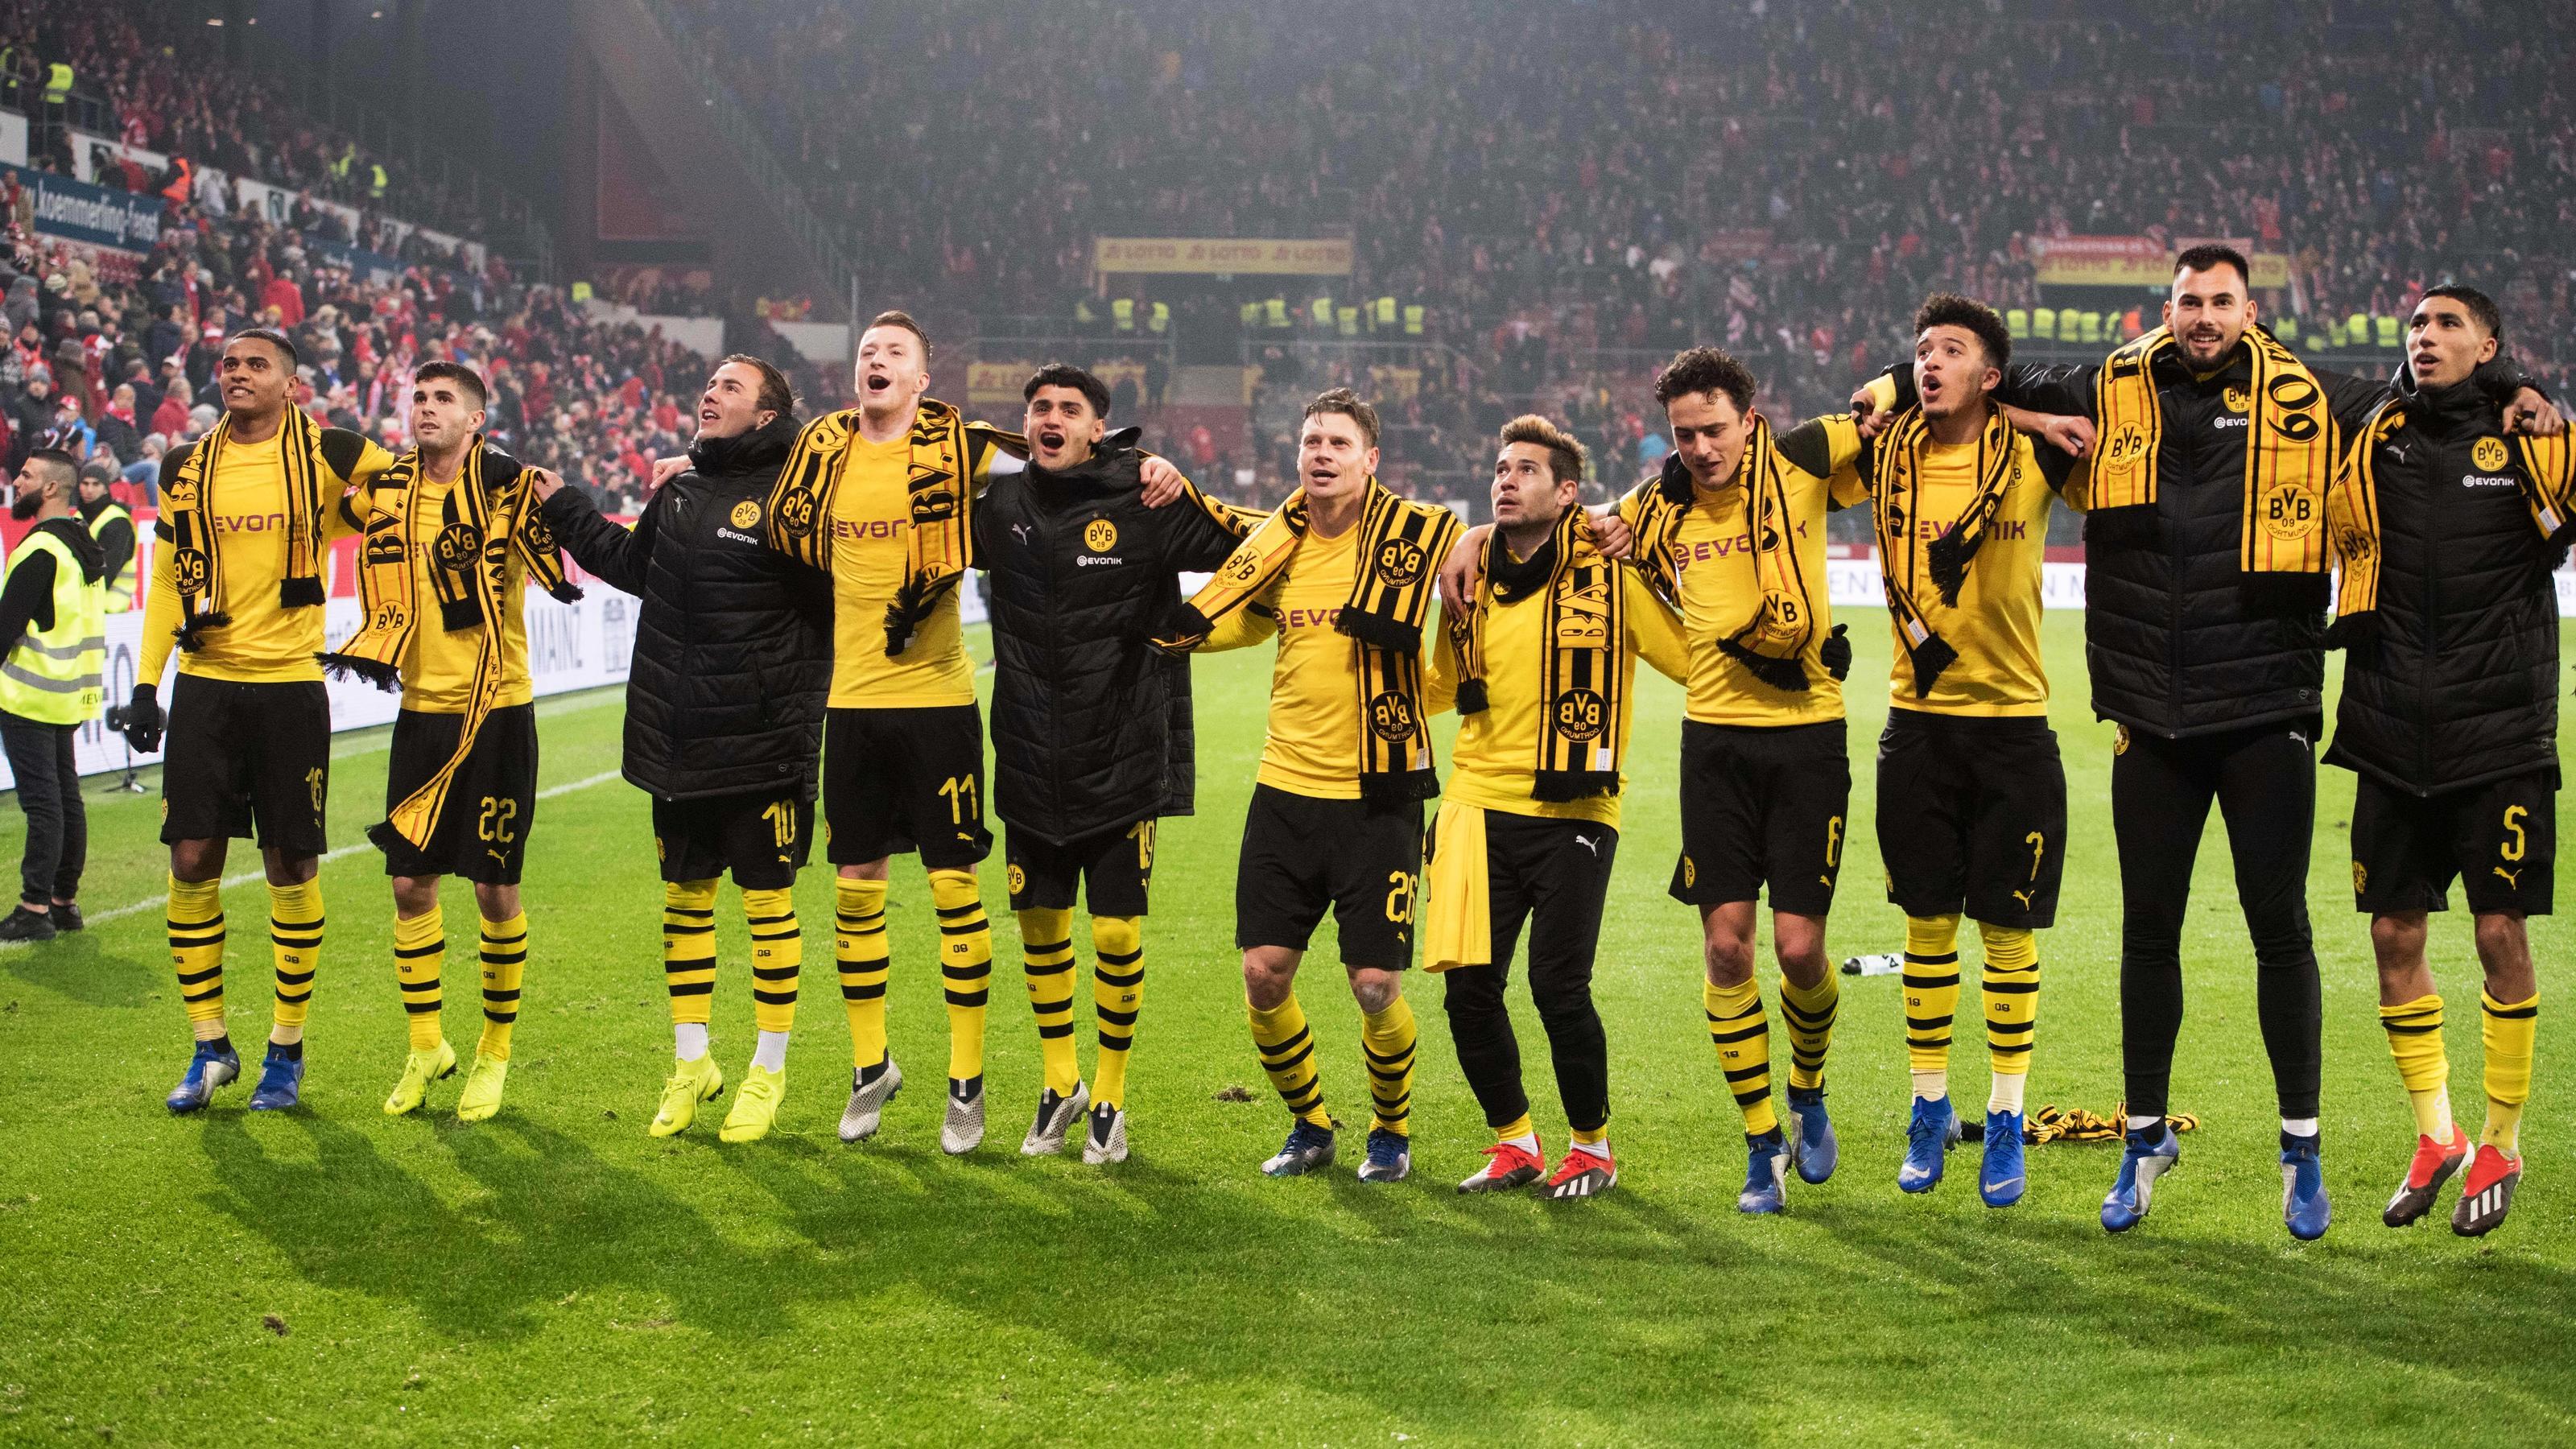 Schalke 04 Meisterschaften